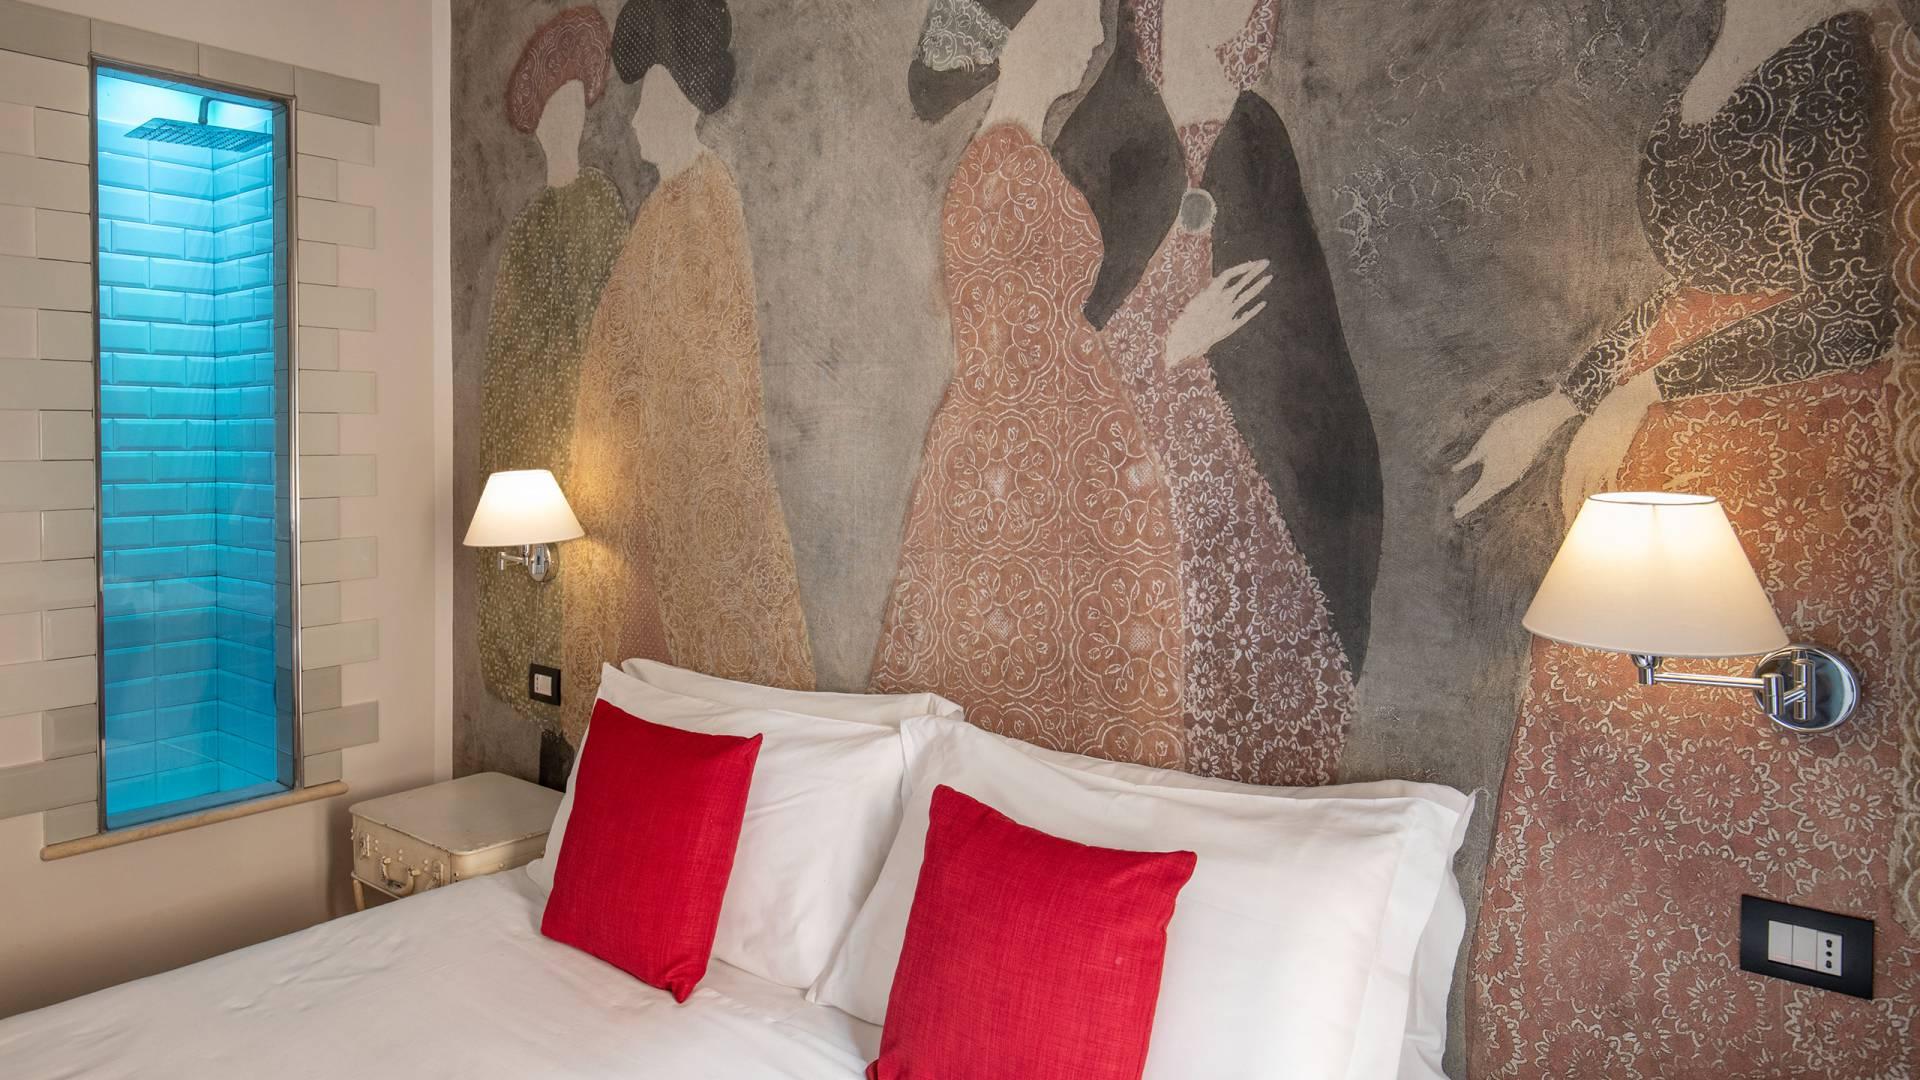 Spagna-Secret-Rooms-Rome-Comfort-10